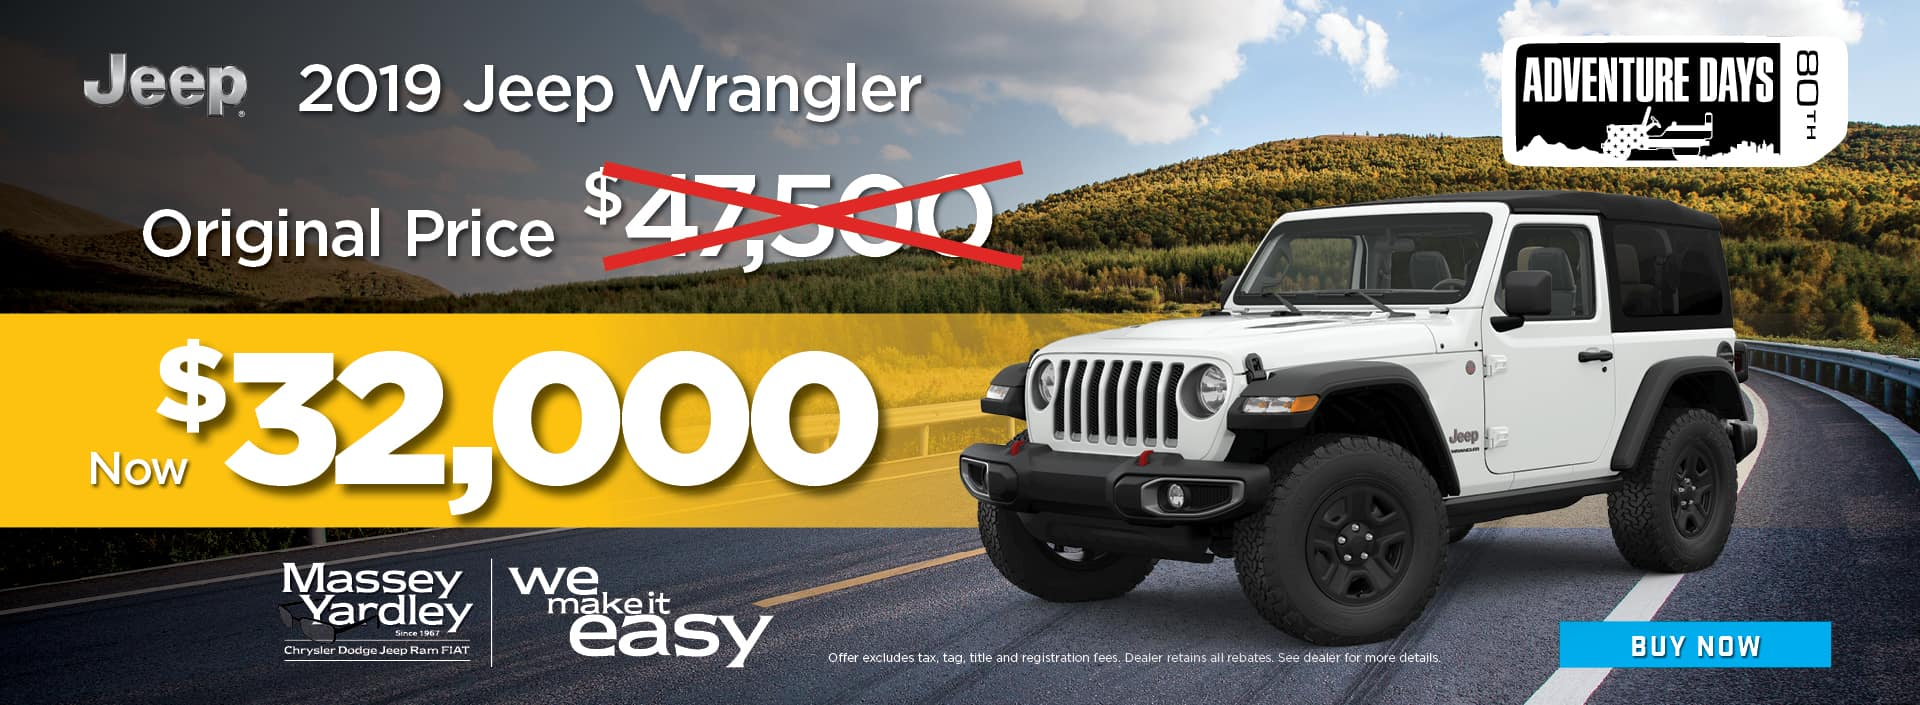 2019 jeep wrangler shop now